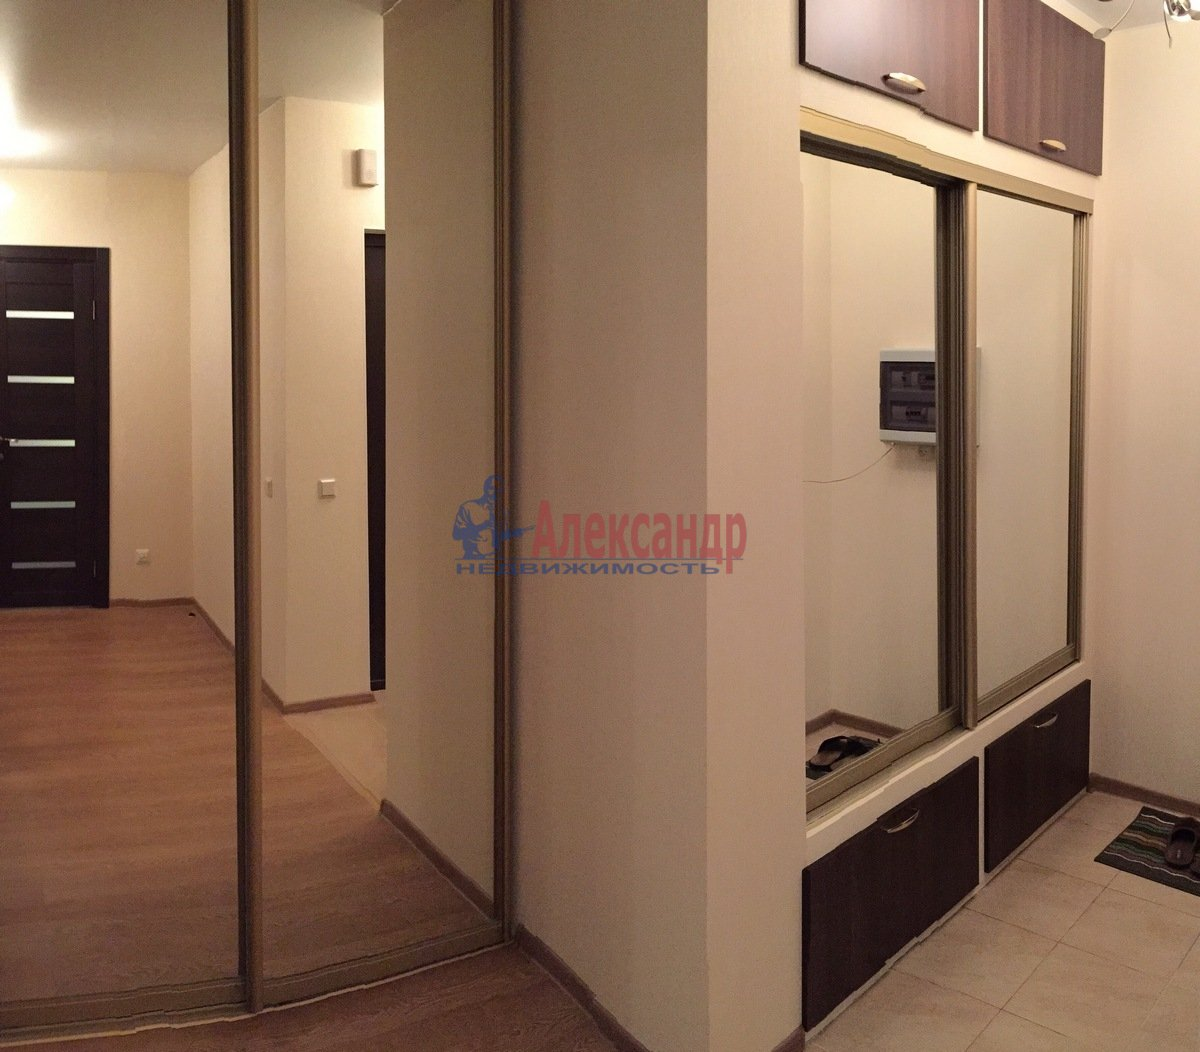 1-комнатная квартира (44м2) в аренду по адресу Маршала Жукова пр., 41— фото 1 из 5